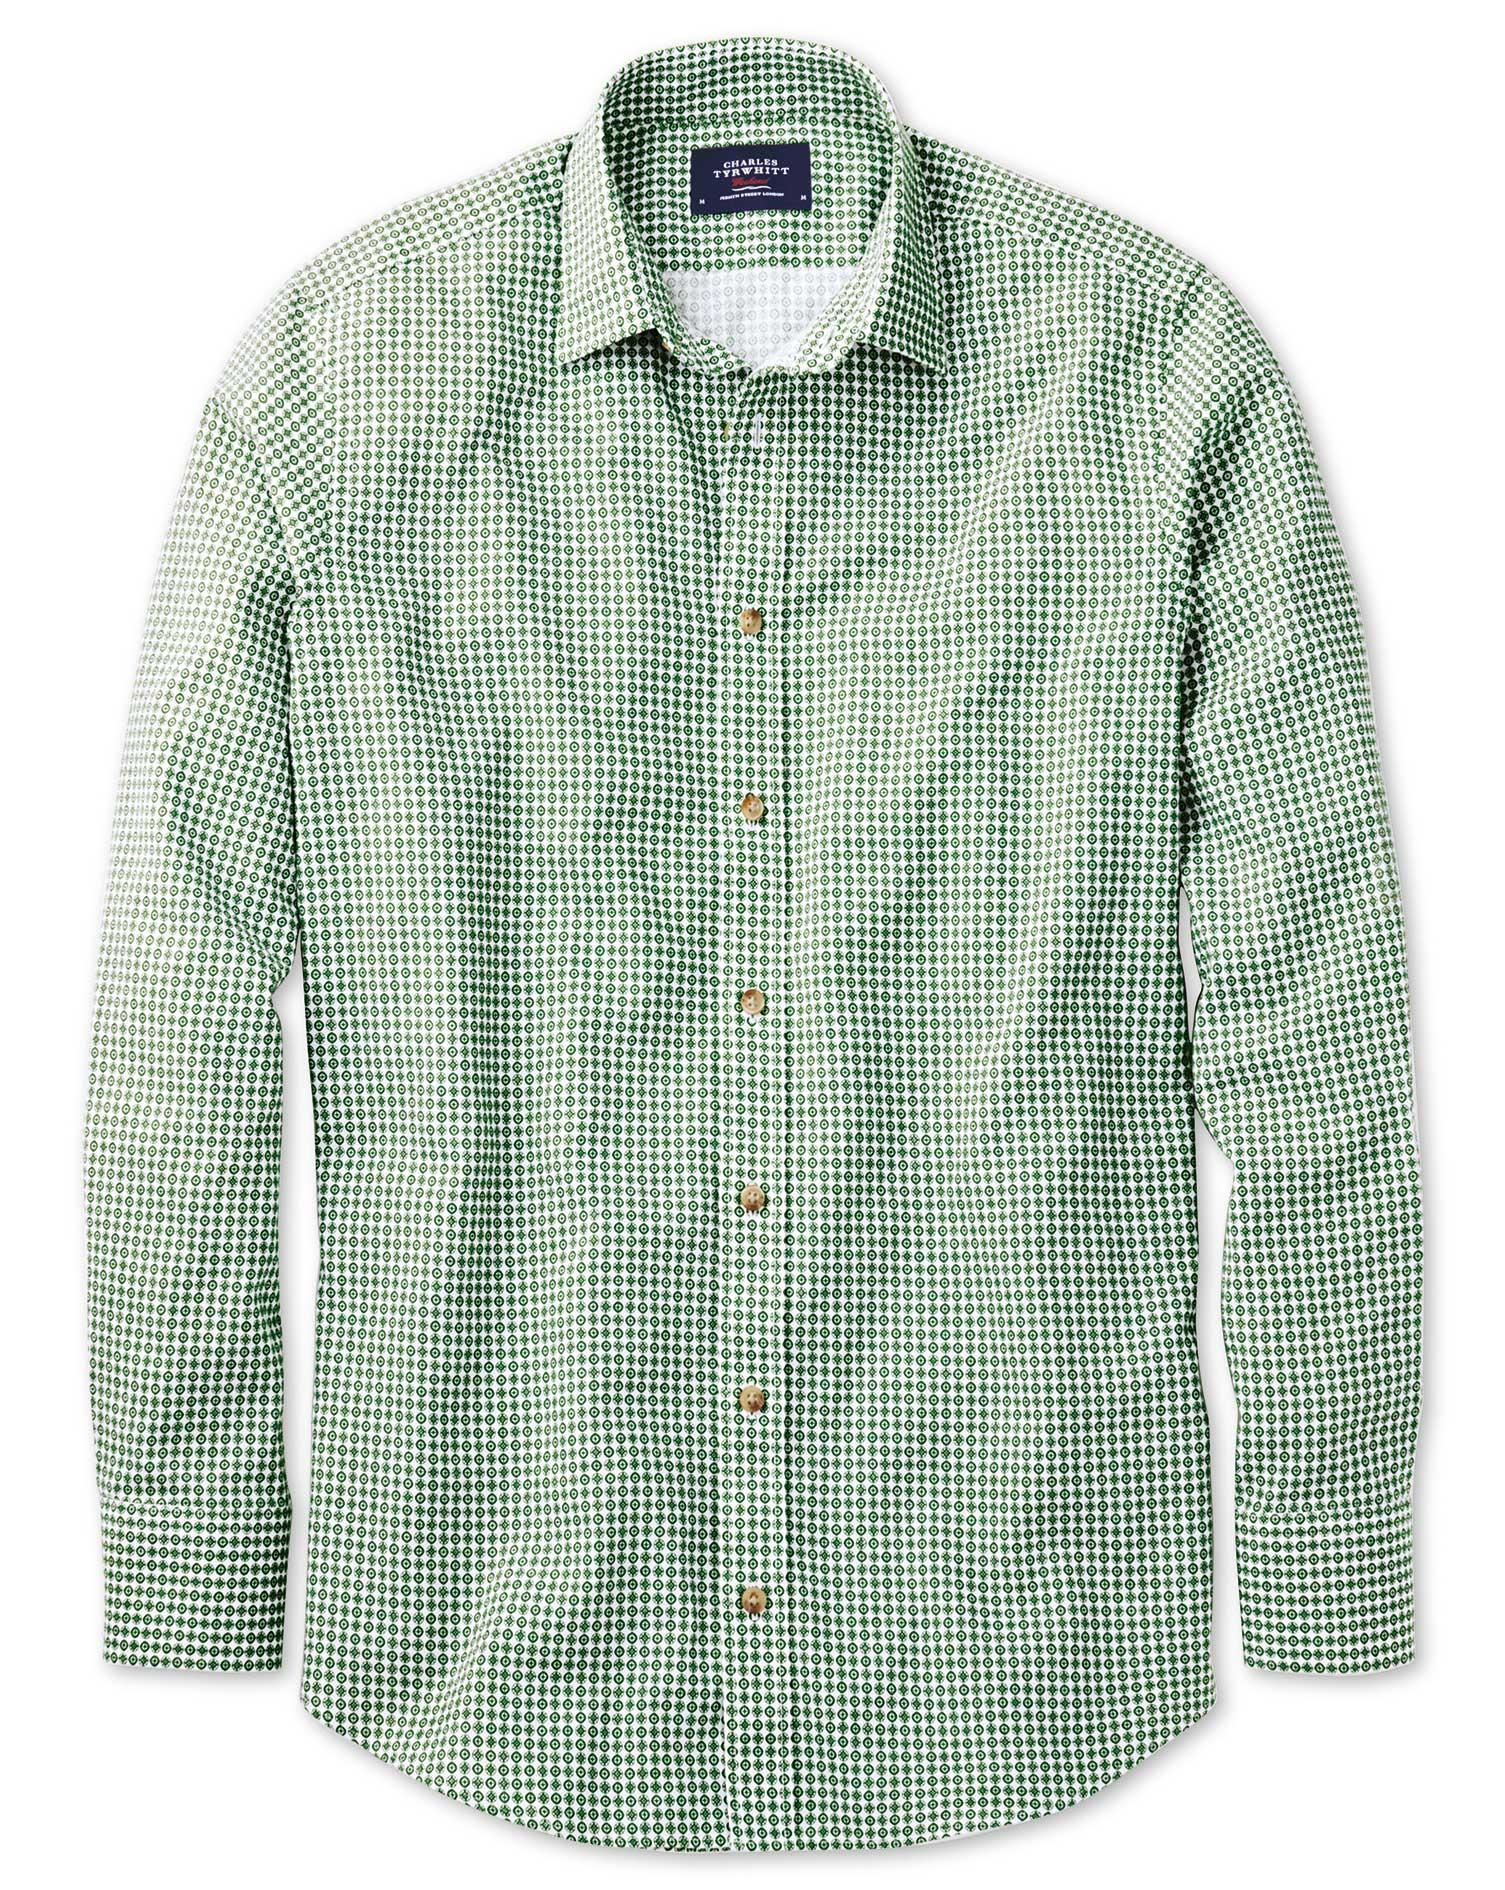 Slim Fit Green Geometric Print Shirt Single Cuff Size XS by Charles Tyrwhitt